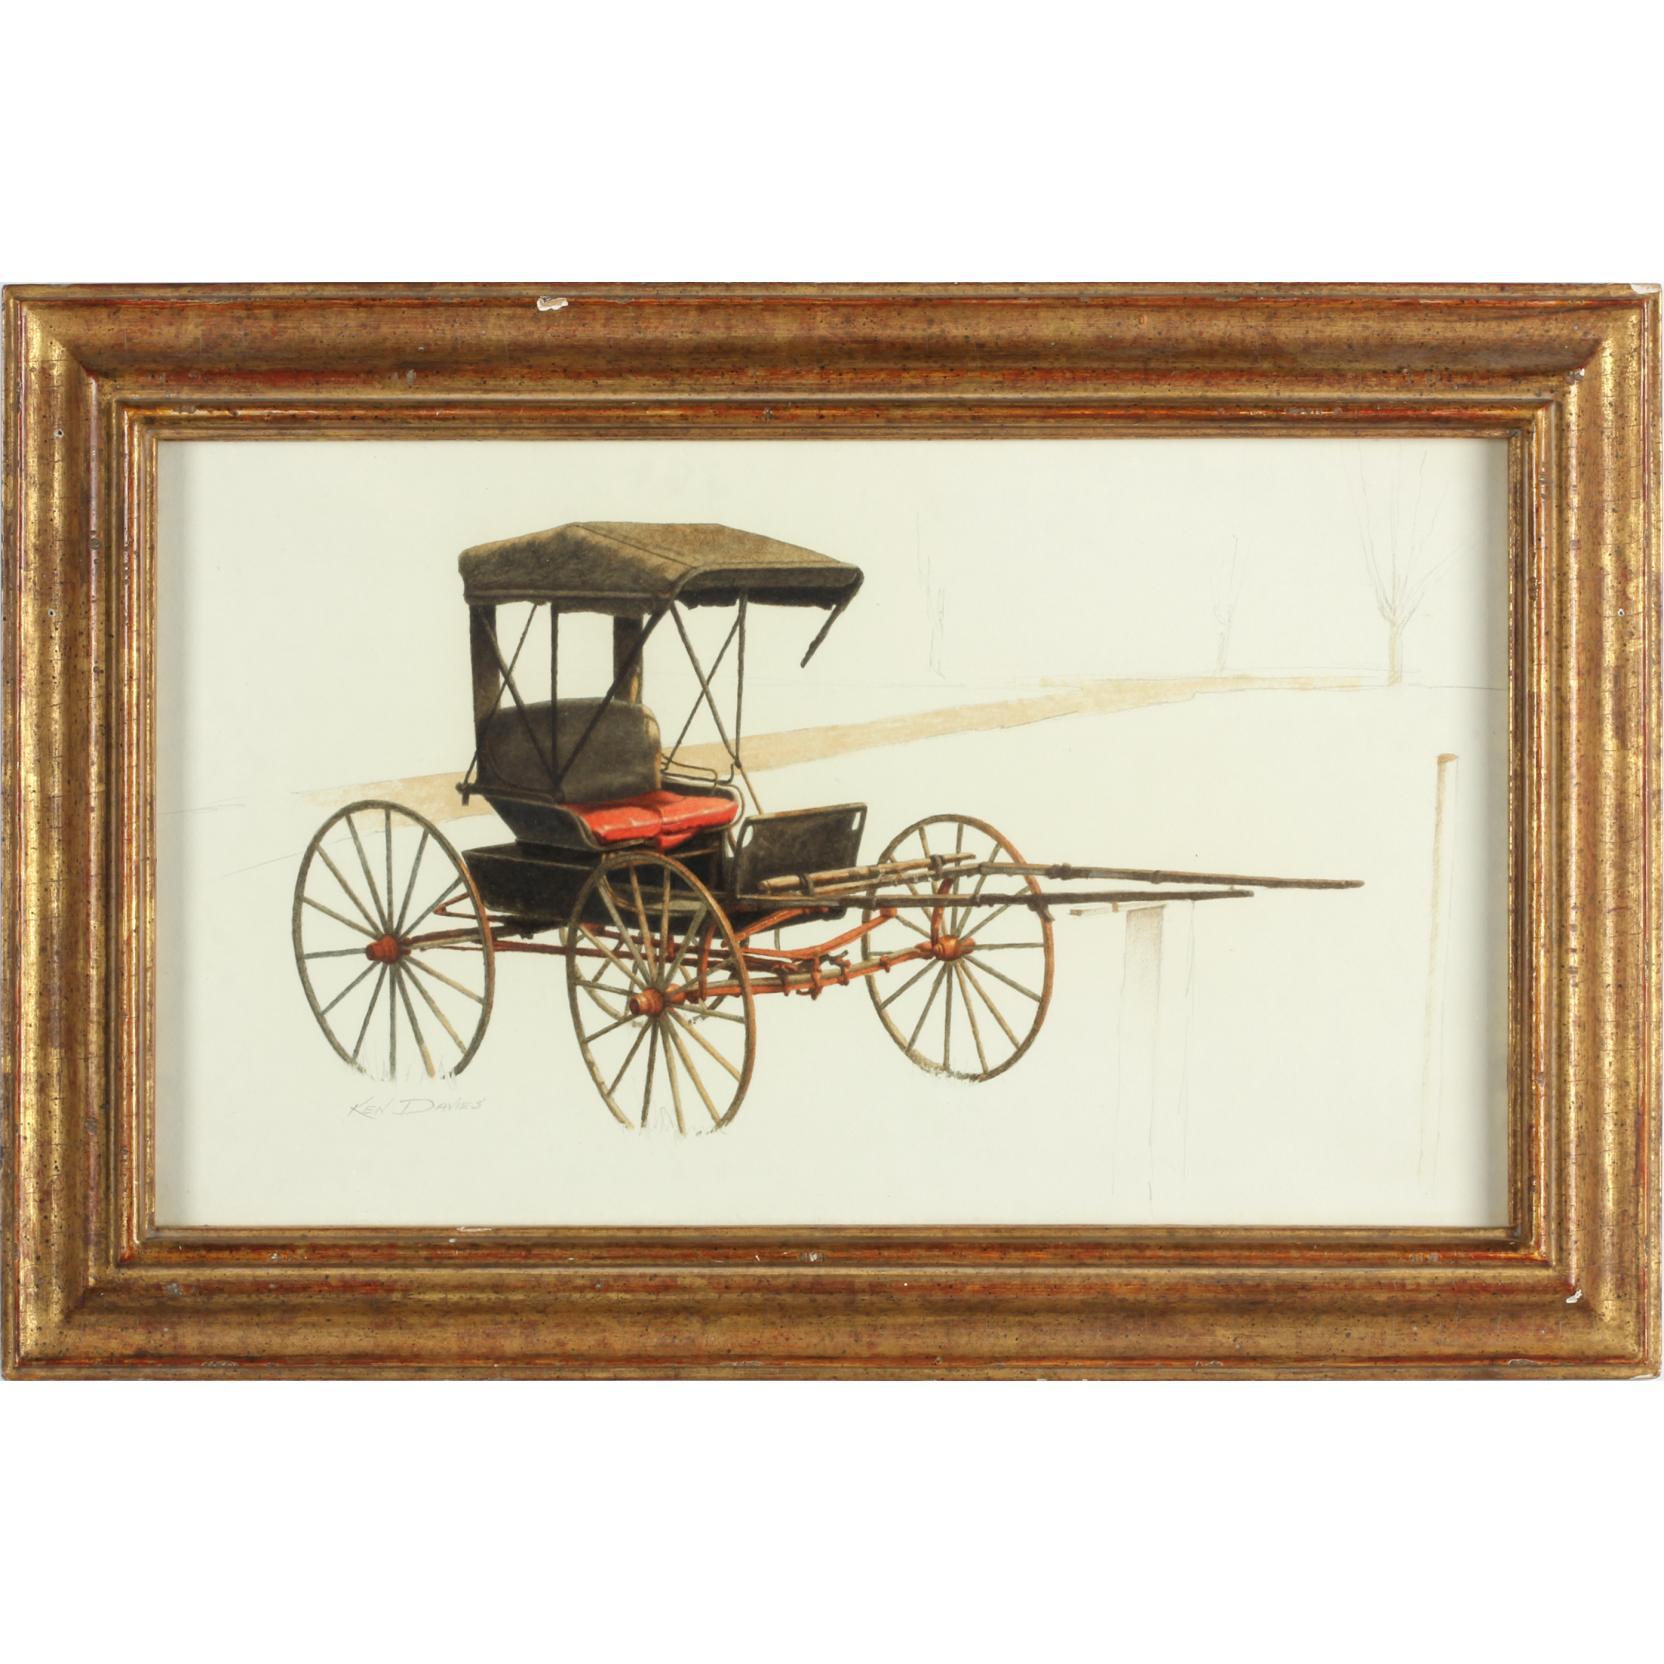 ken-davies-ct-ma-b-1925-carriage